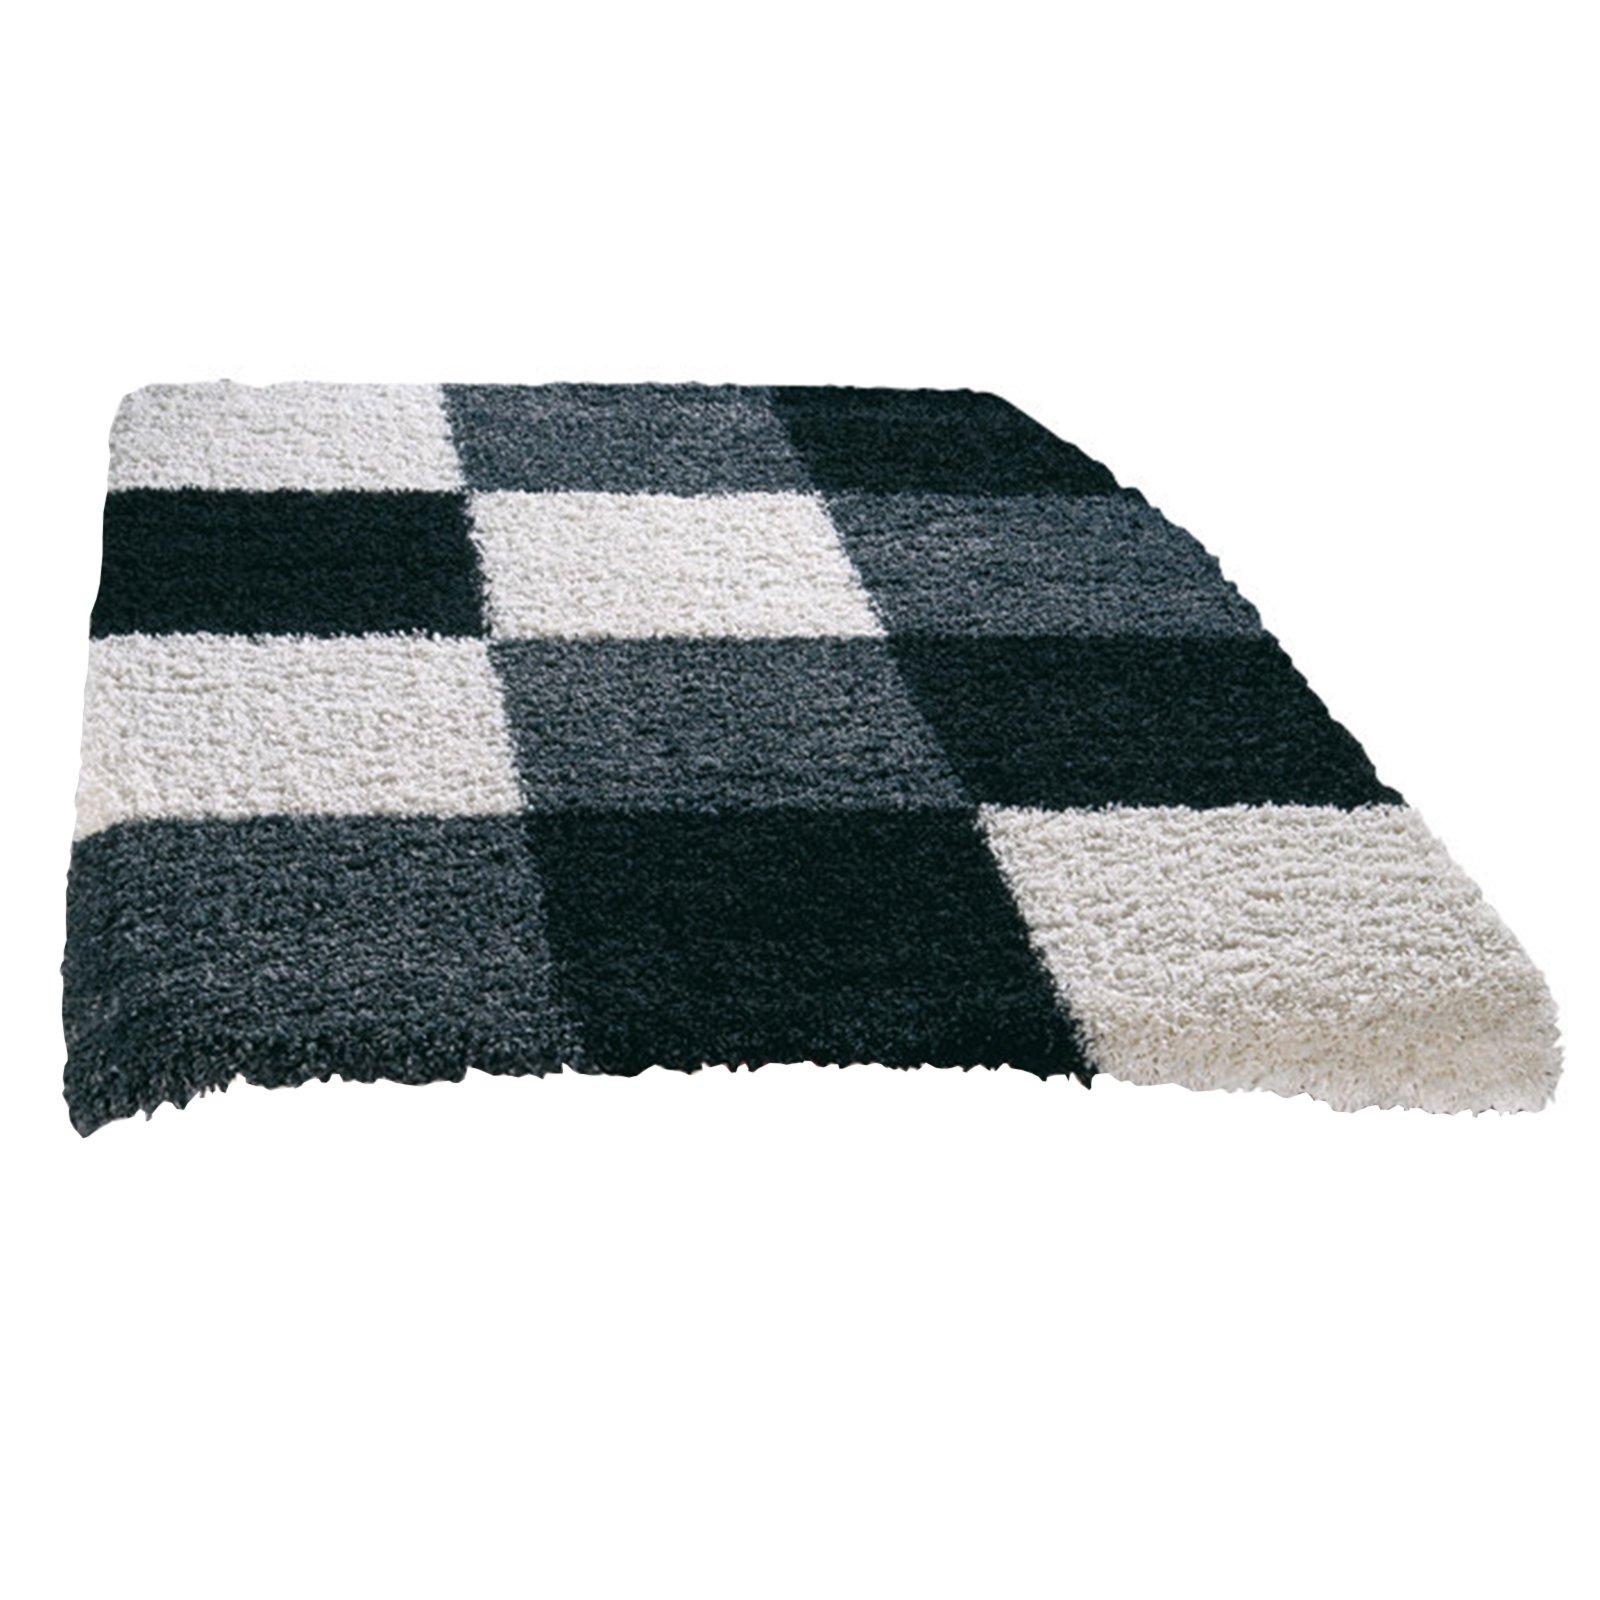 hochflor teppich shaggy plus wei schwarz 200x290 cm. Black Bedroom Furniture Sets. Home Design Ideas